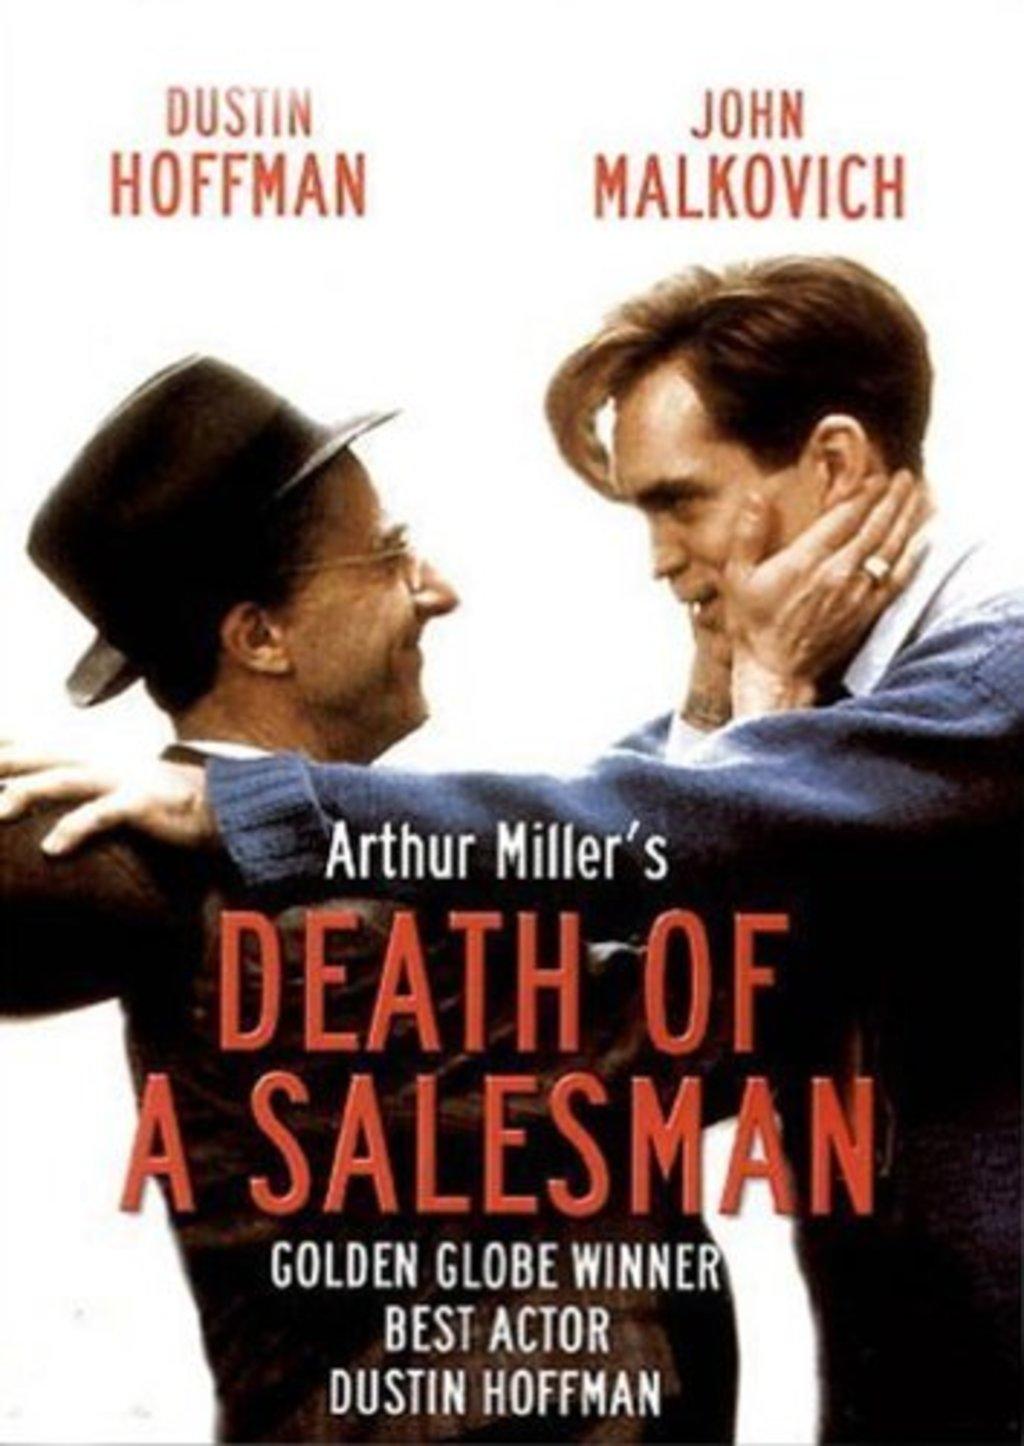 Watch Death Of A Salesman On Netflix Today Netflixmovies Com